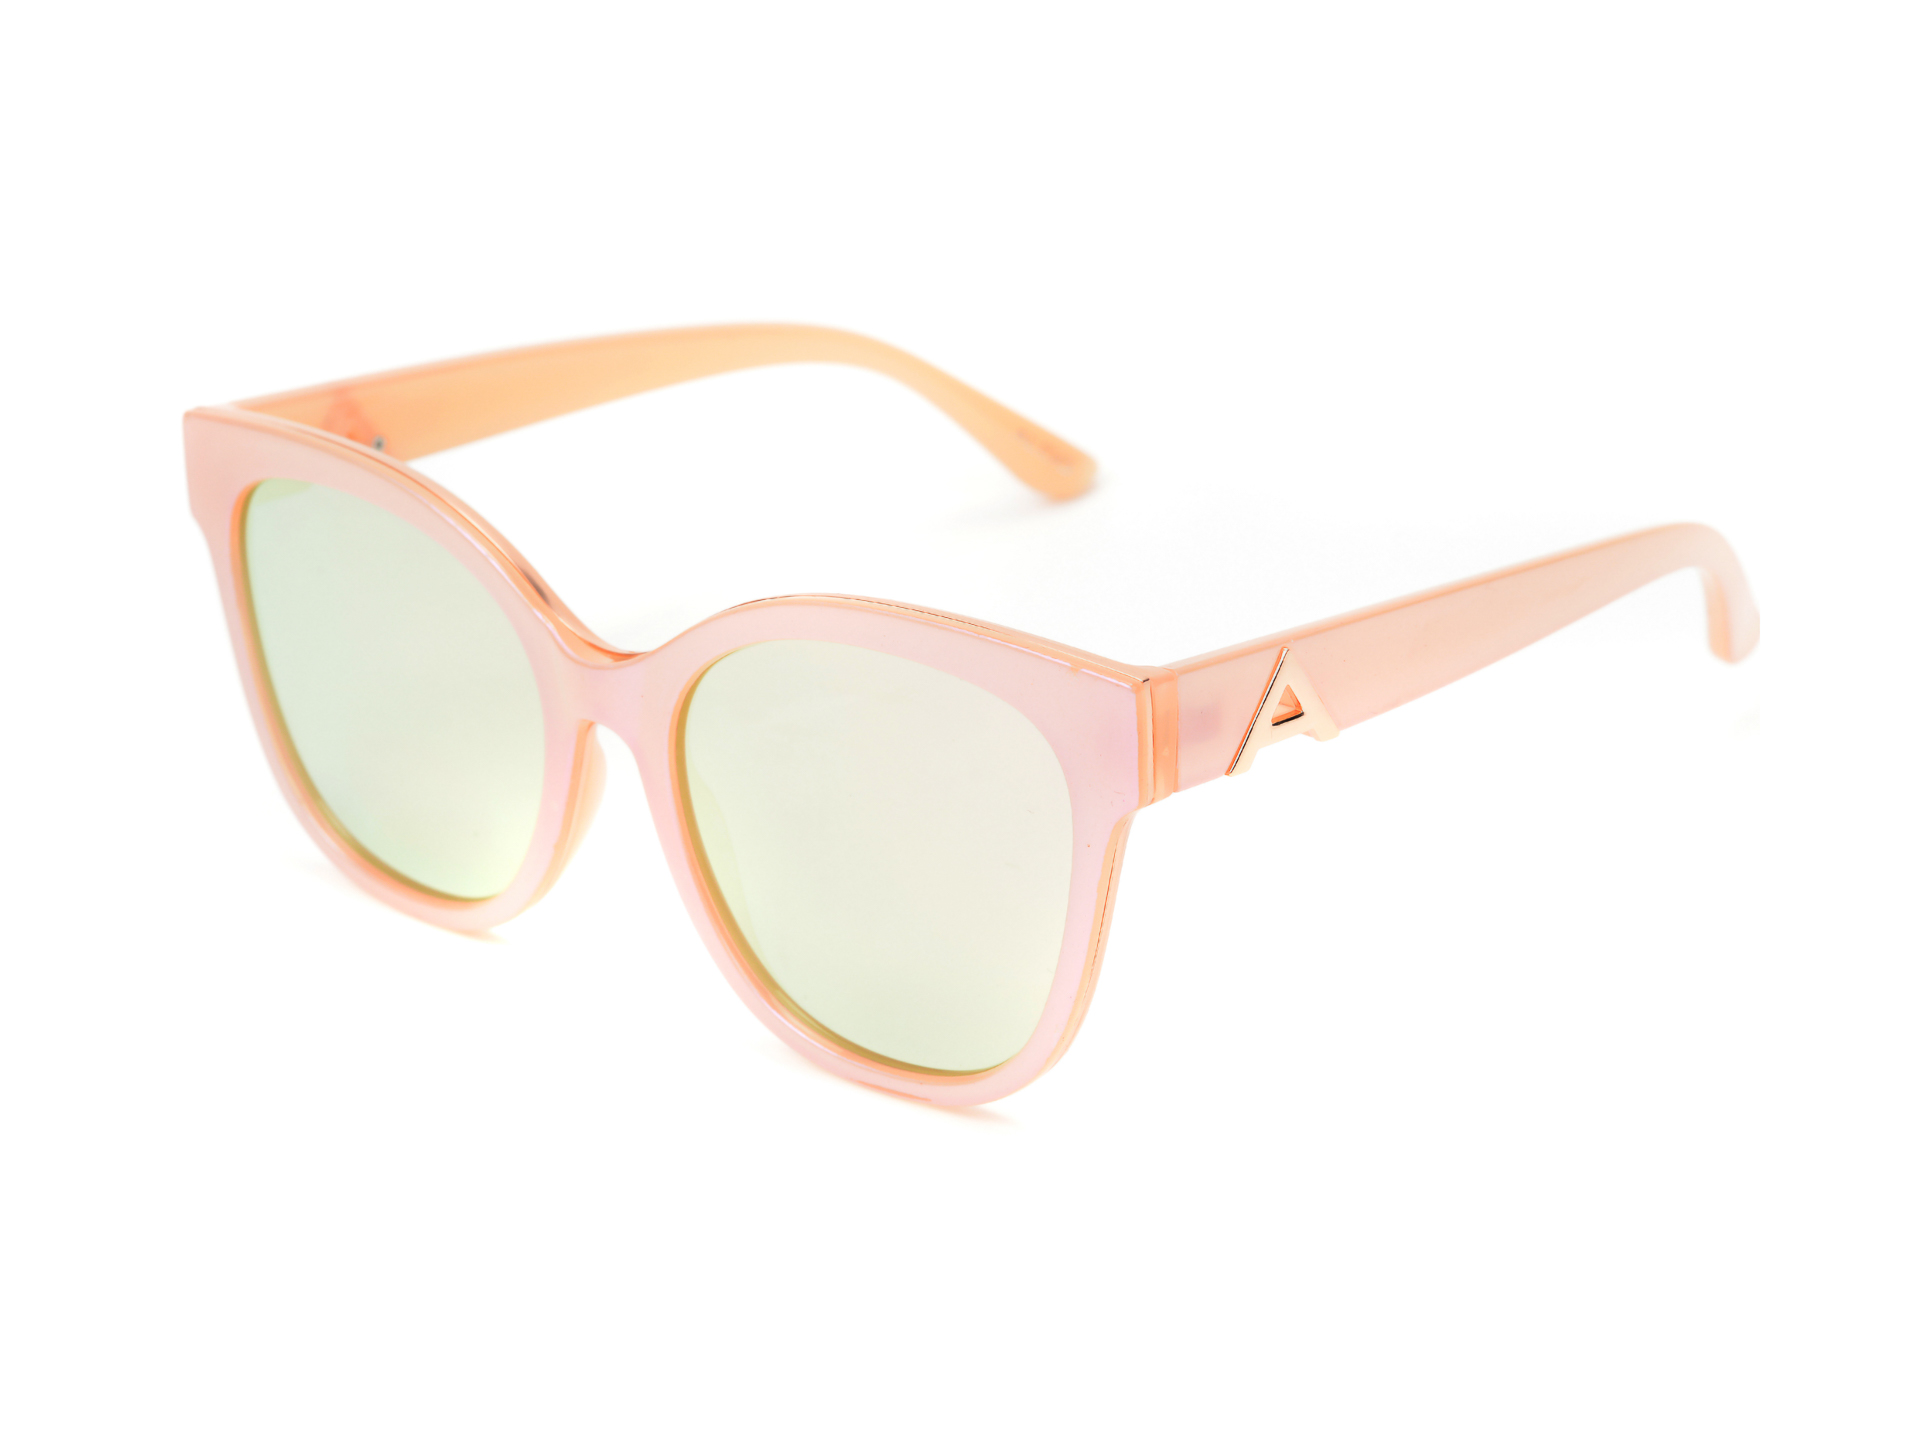 Ochelari de soare ALDO roz, Paltra680, din PVC imagine